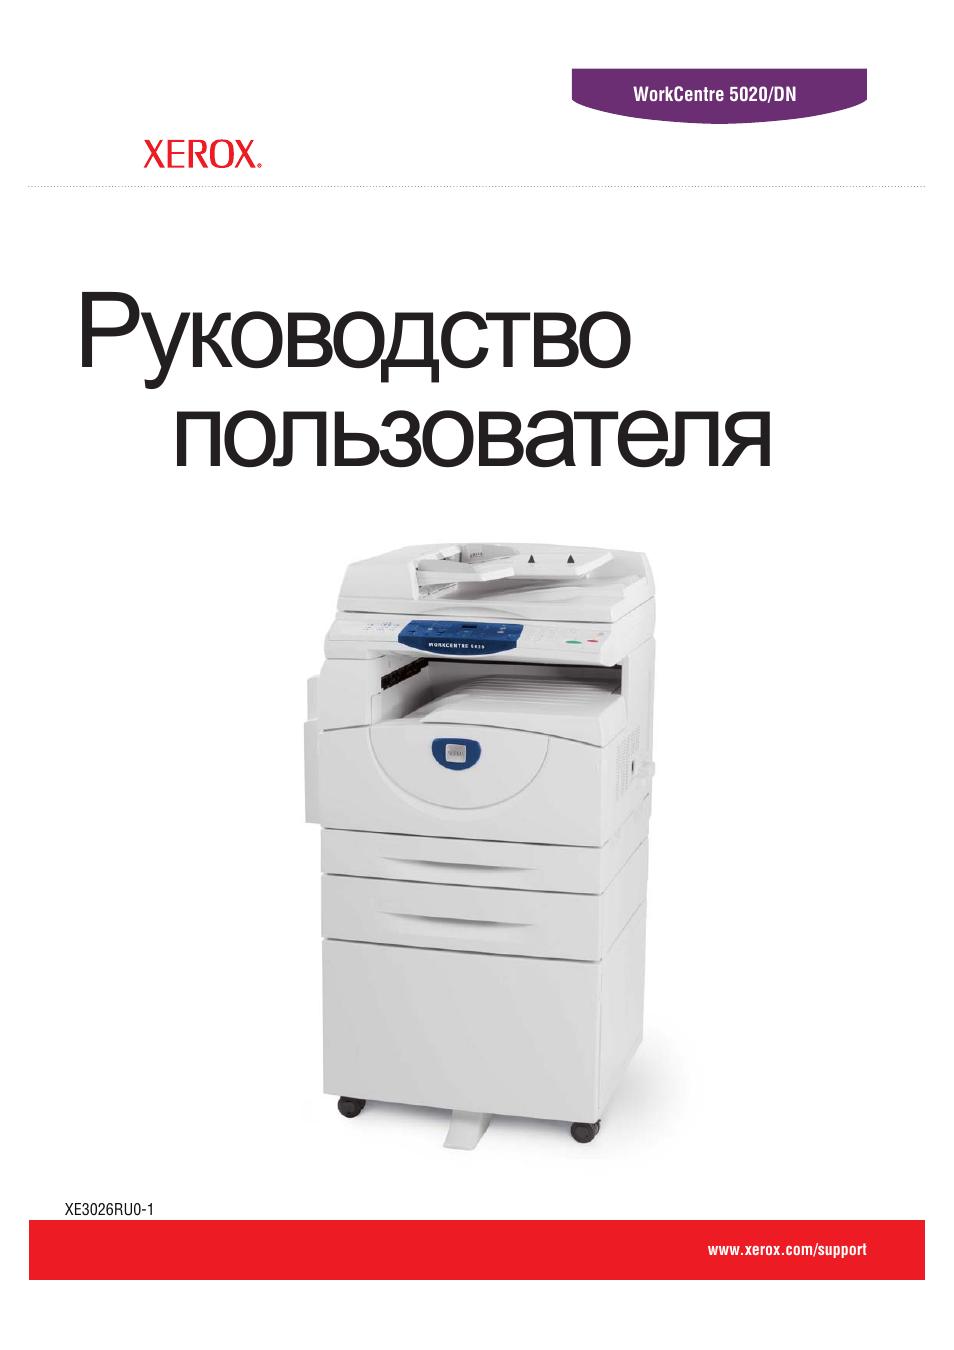 Инструкция по эксплуатации ксерокса